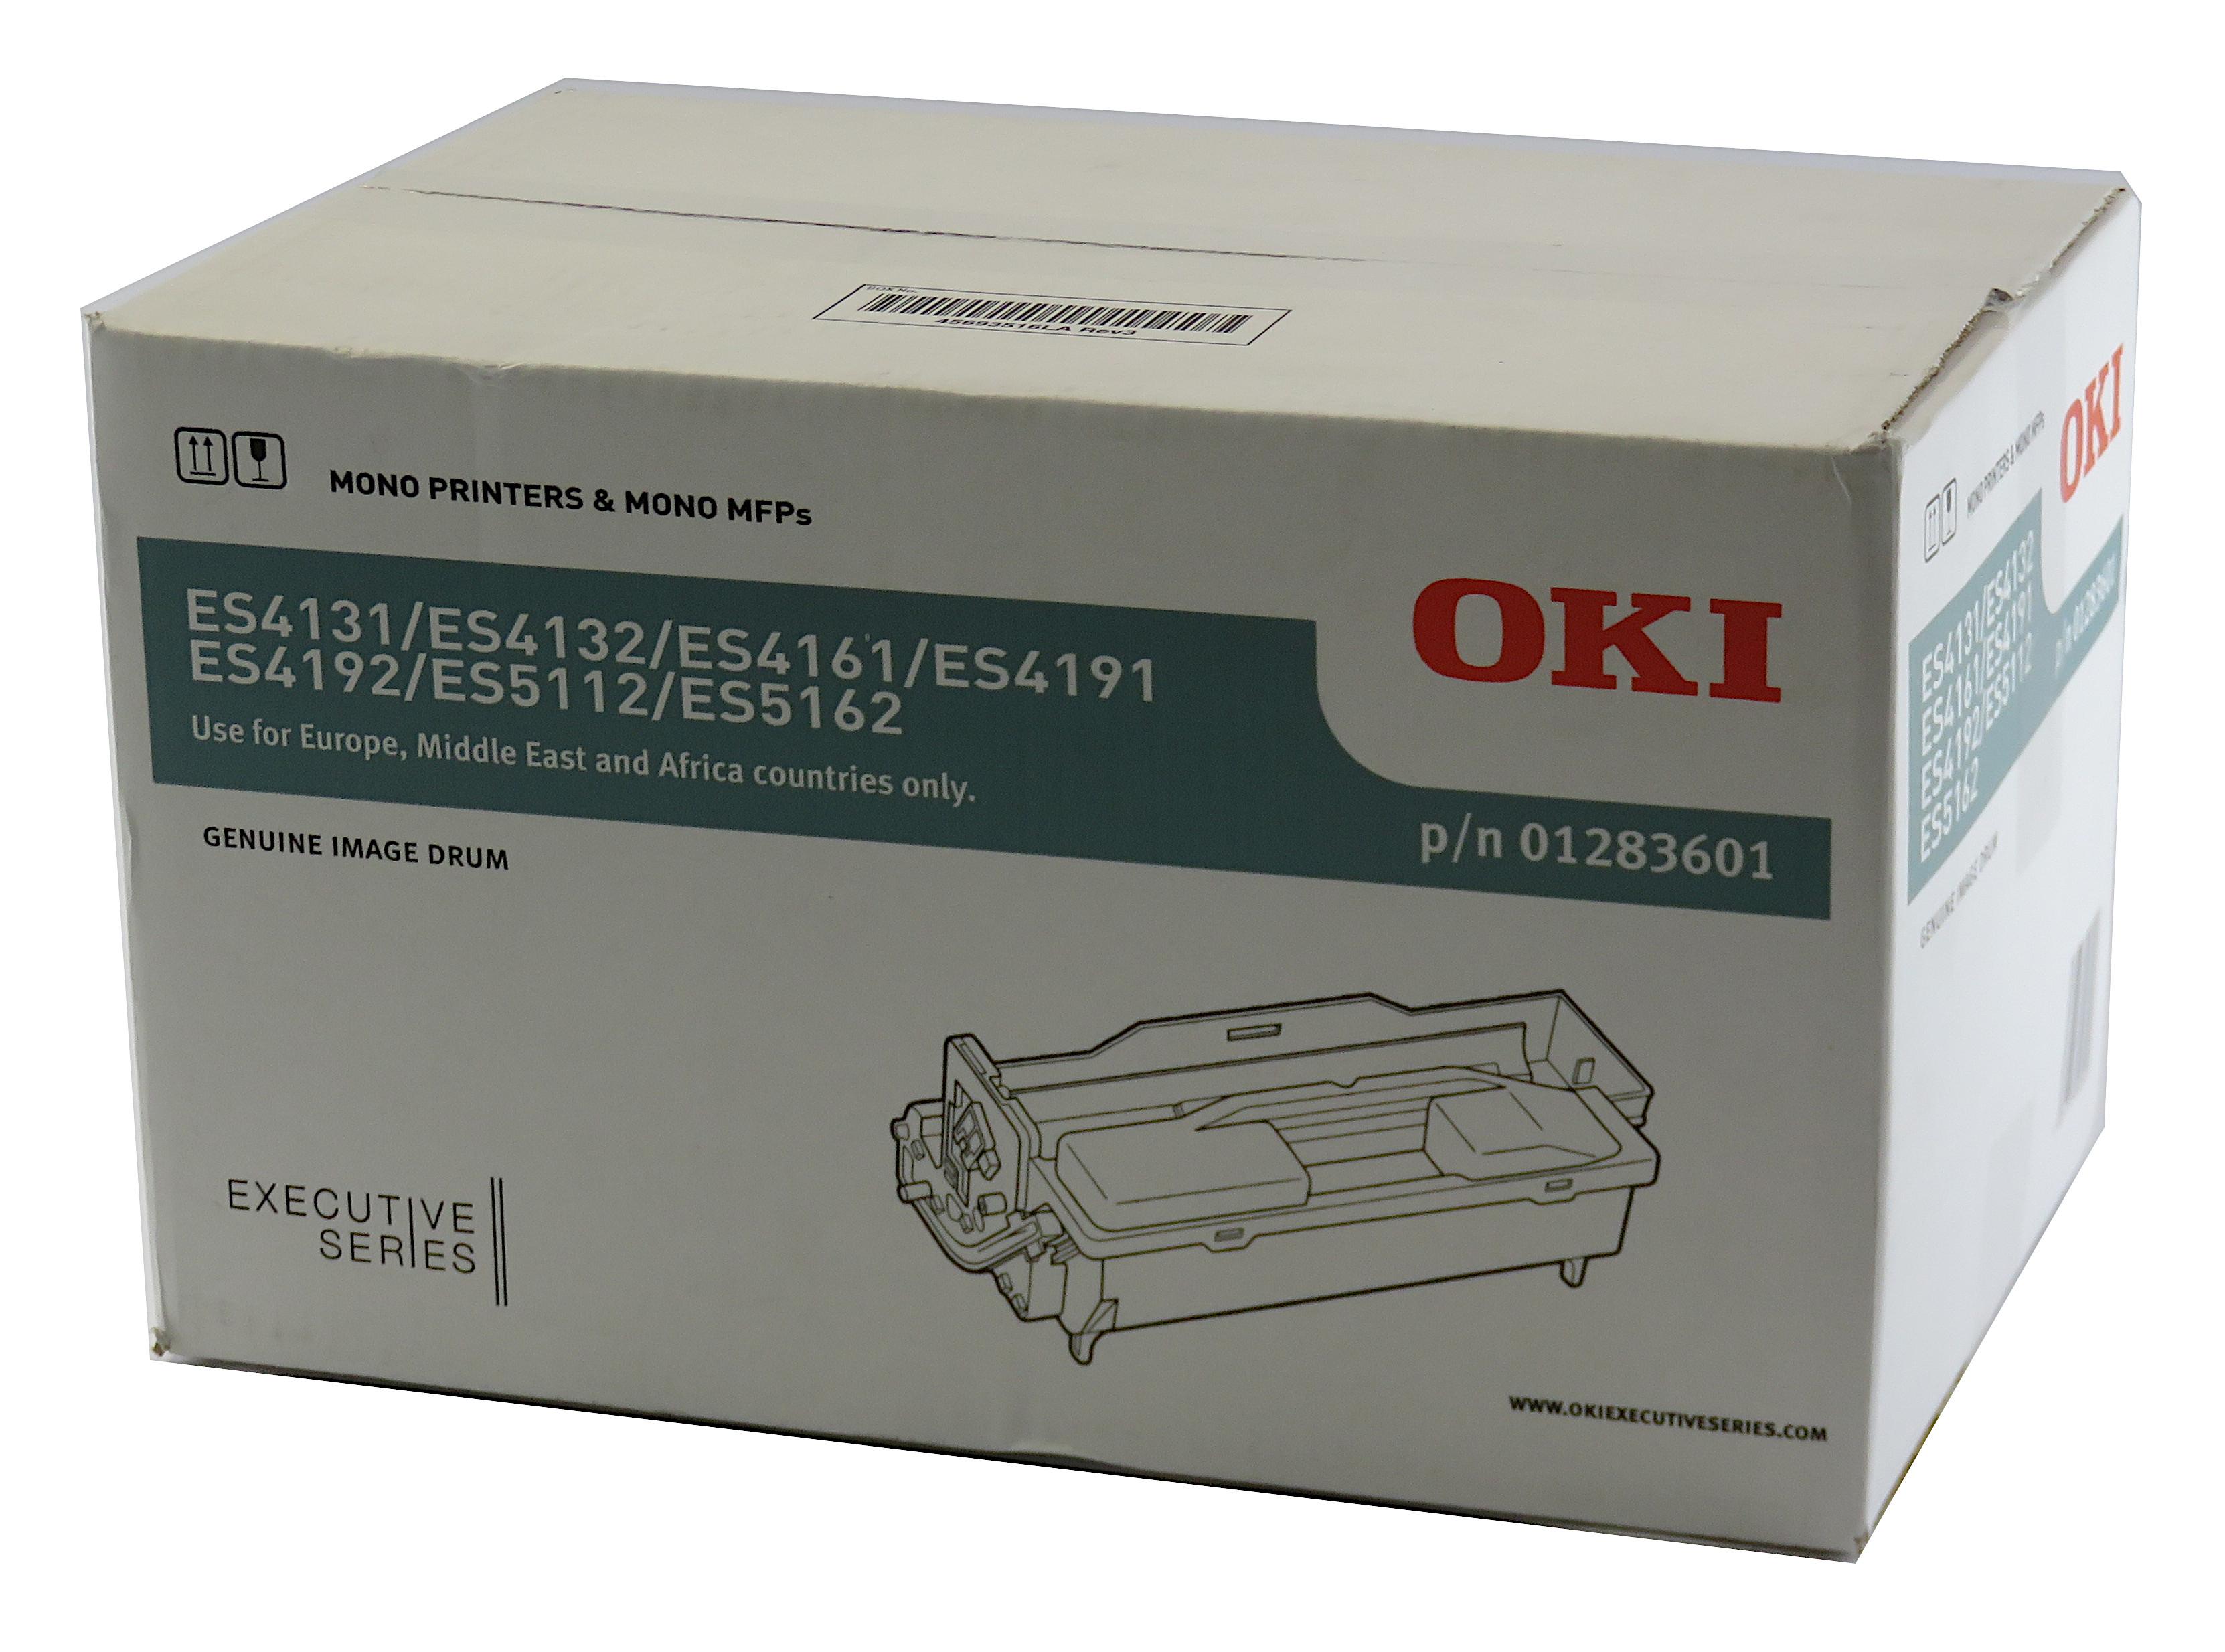 Genuine OKI Image Drum 01283601 f/ ES Series Mono Printers & Mono MFPs